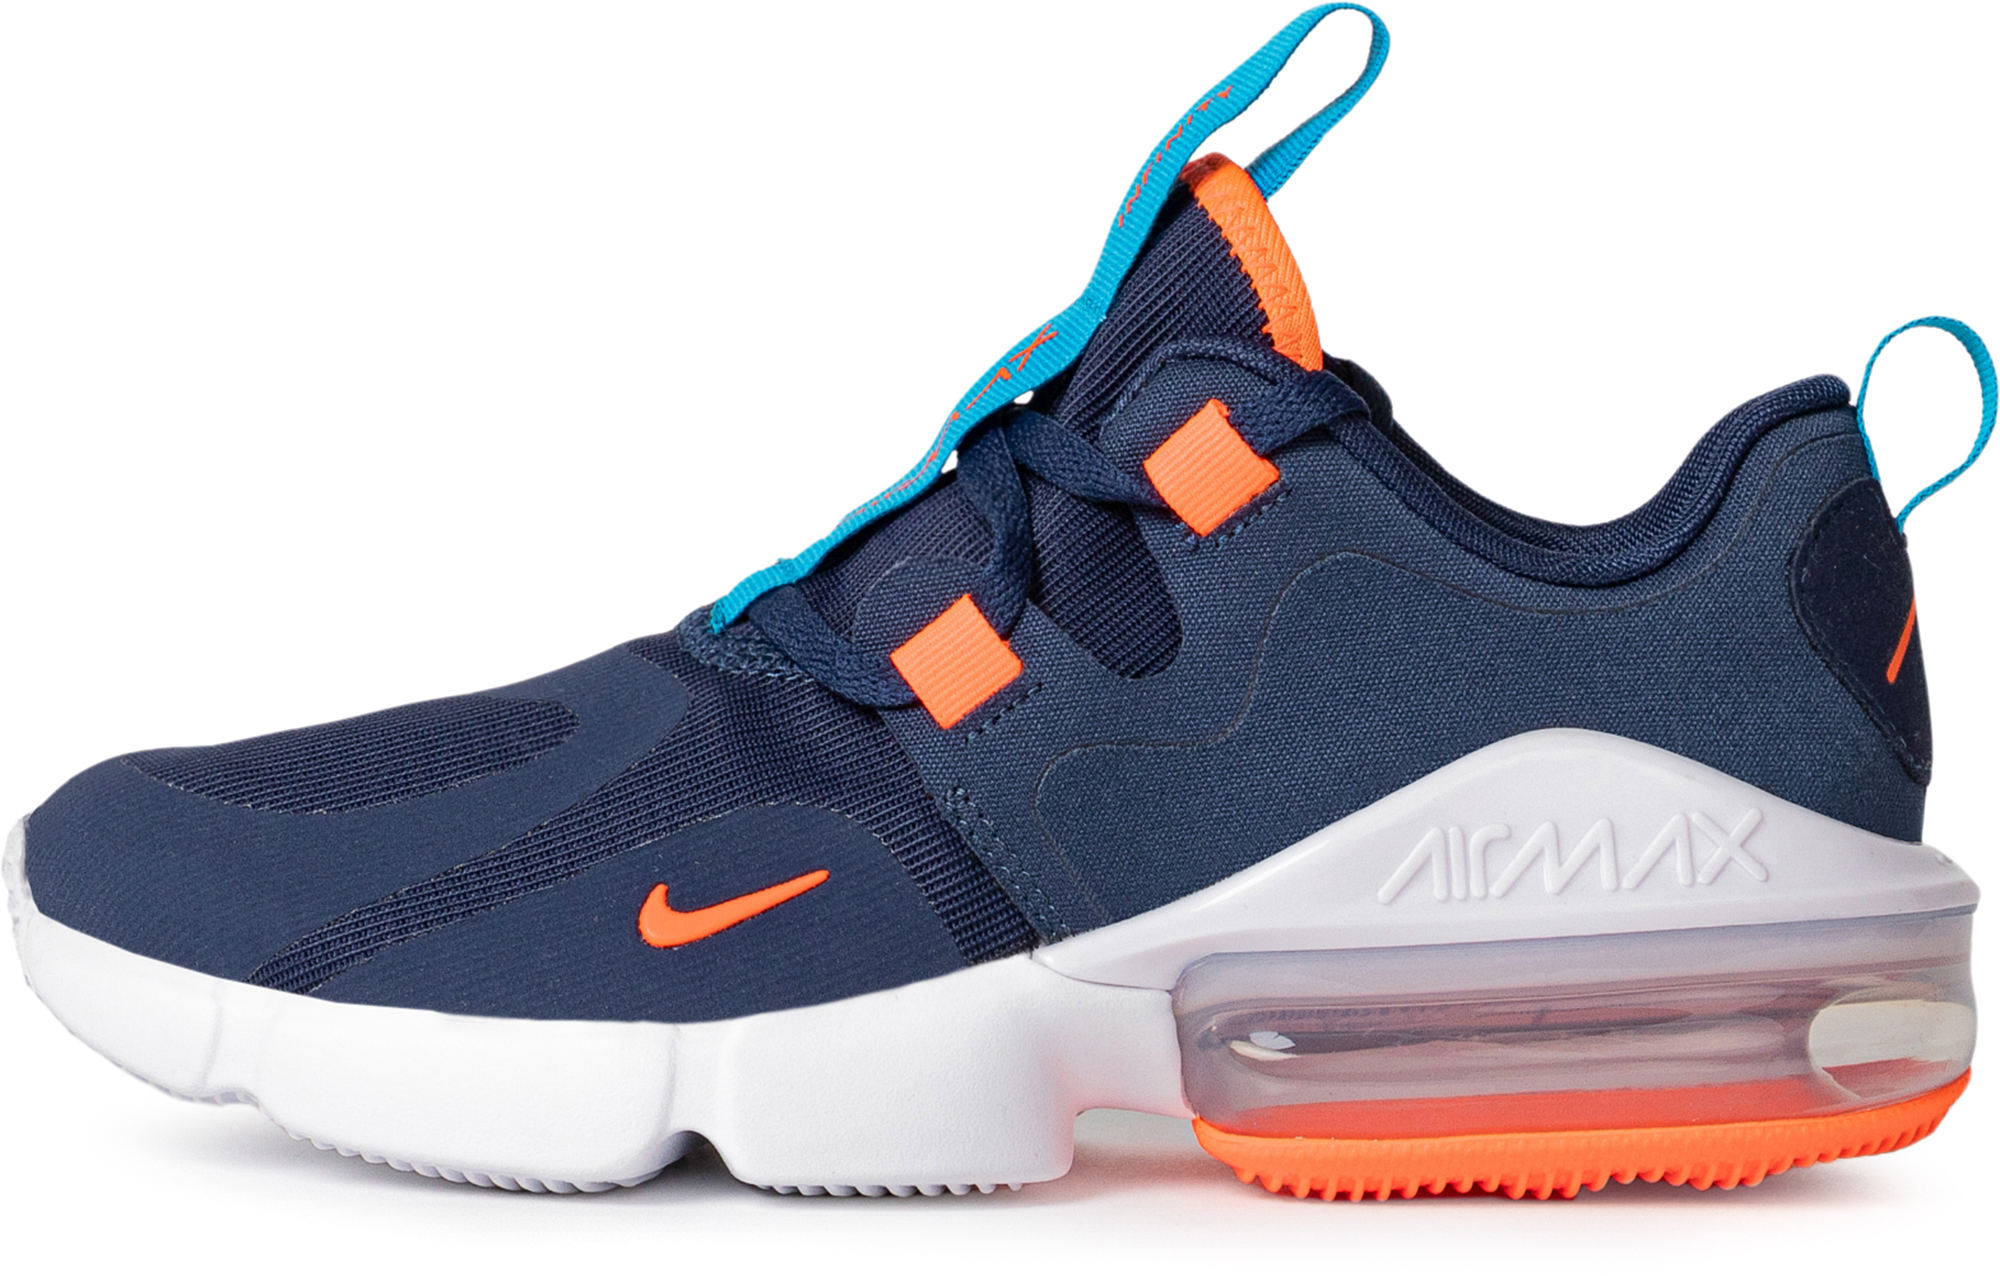 Nike Кроссовки детские Nike Air Max Infinity (Gs), размер 37 кроссовки nike cortez basic ltr se gs shoe girls aa3043 001